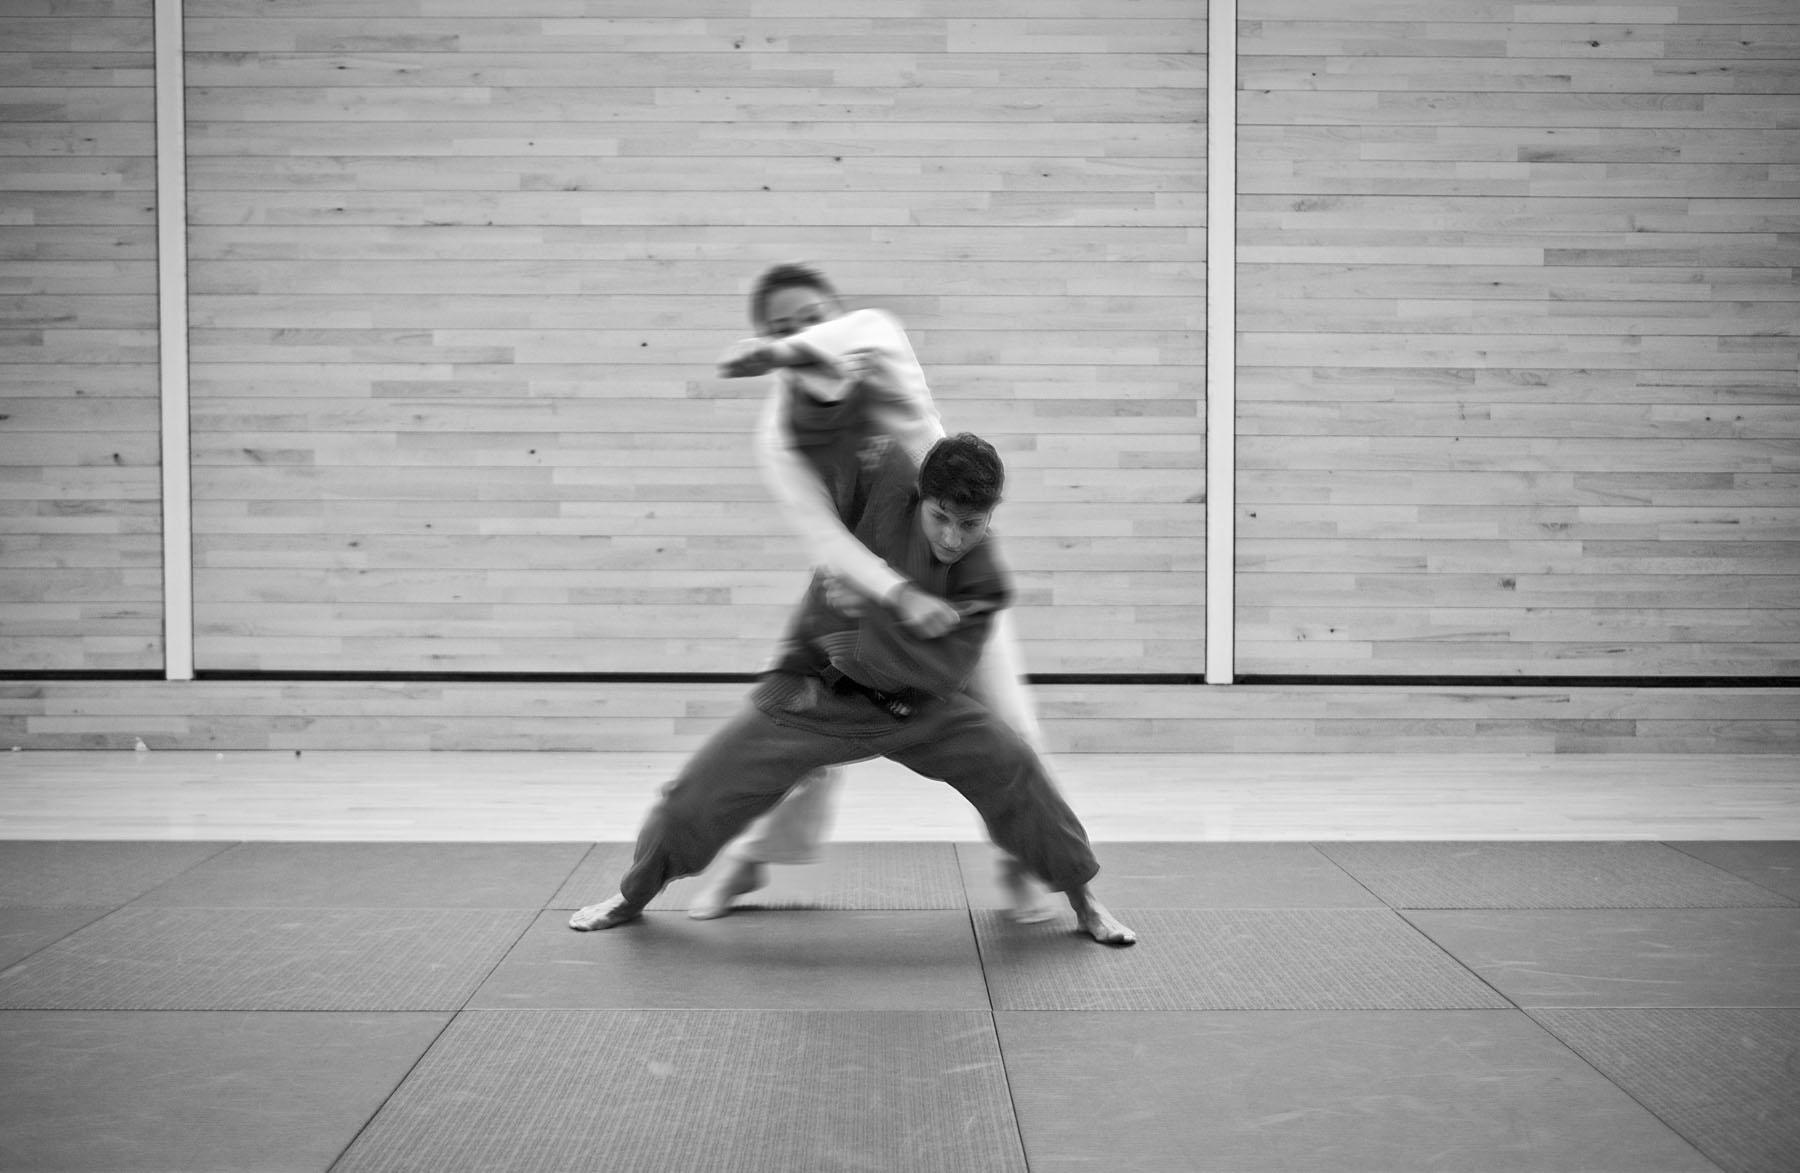 Sophie Cox, Judo TeamGB